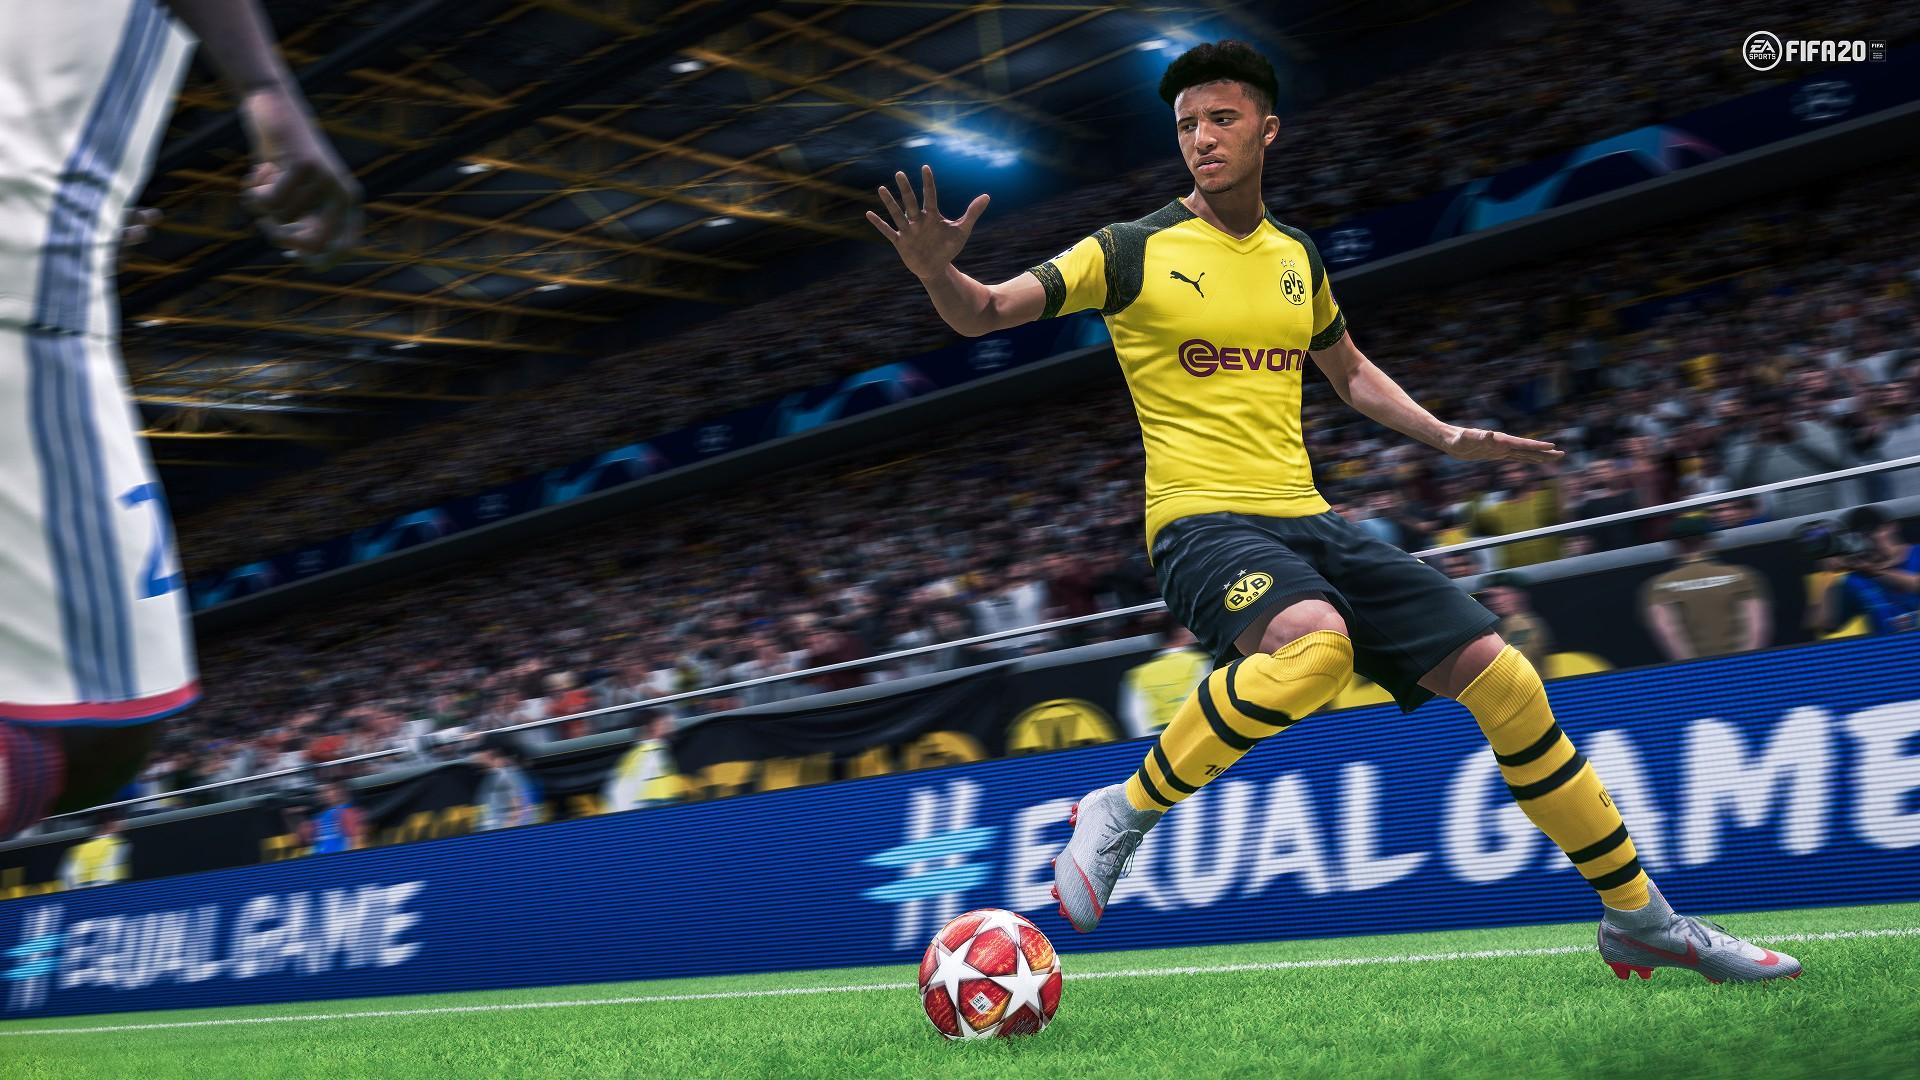 FIFA 20 Clé CD gratuite 2